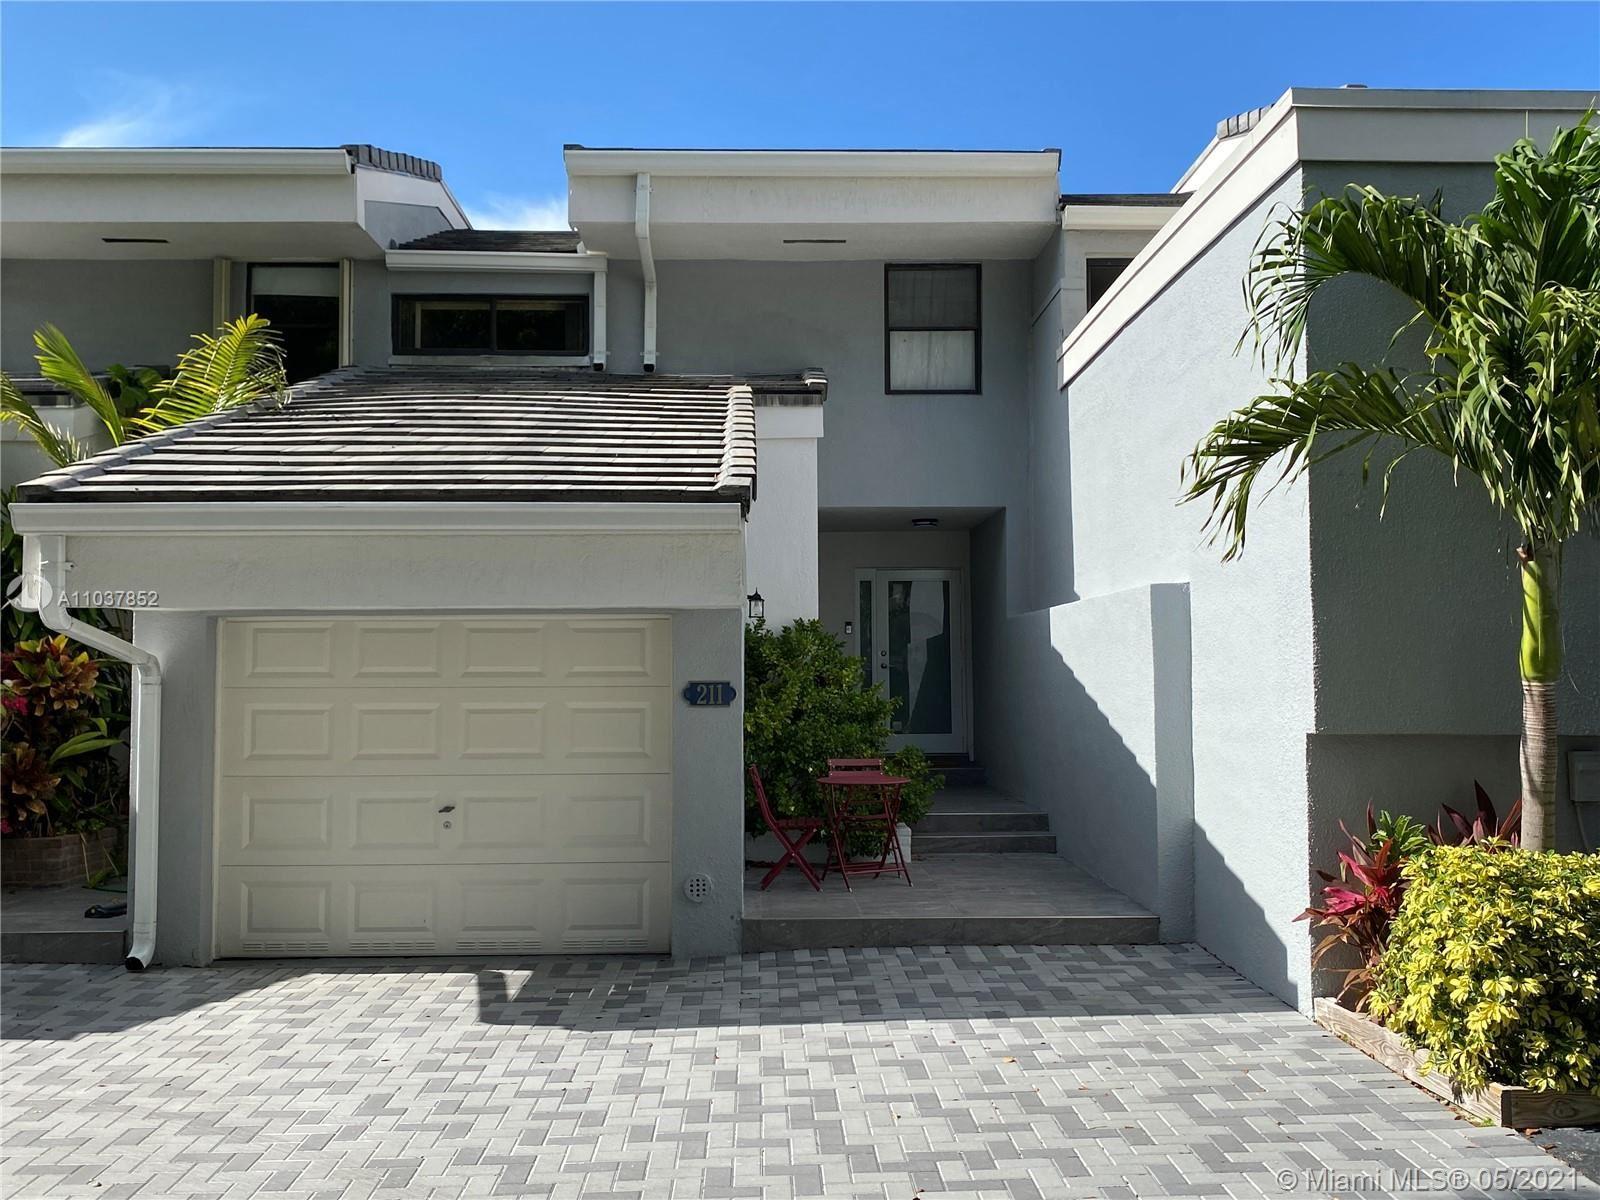 Photo of 211 Poinciana Dr #201, Sunny Isles Beach, FL 33160 (MLS # A11037852)